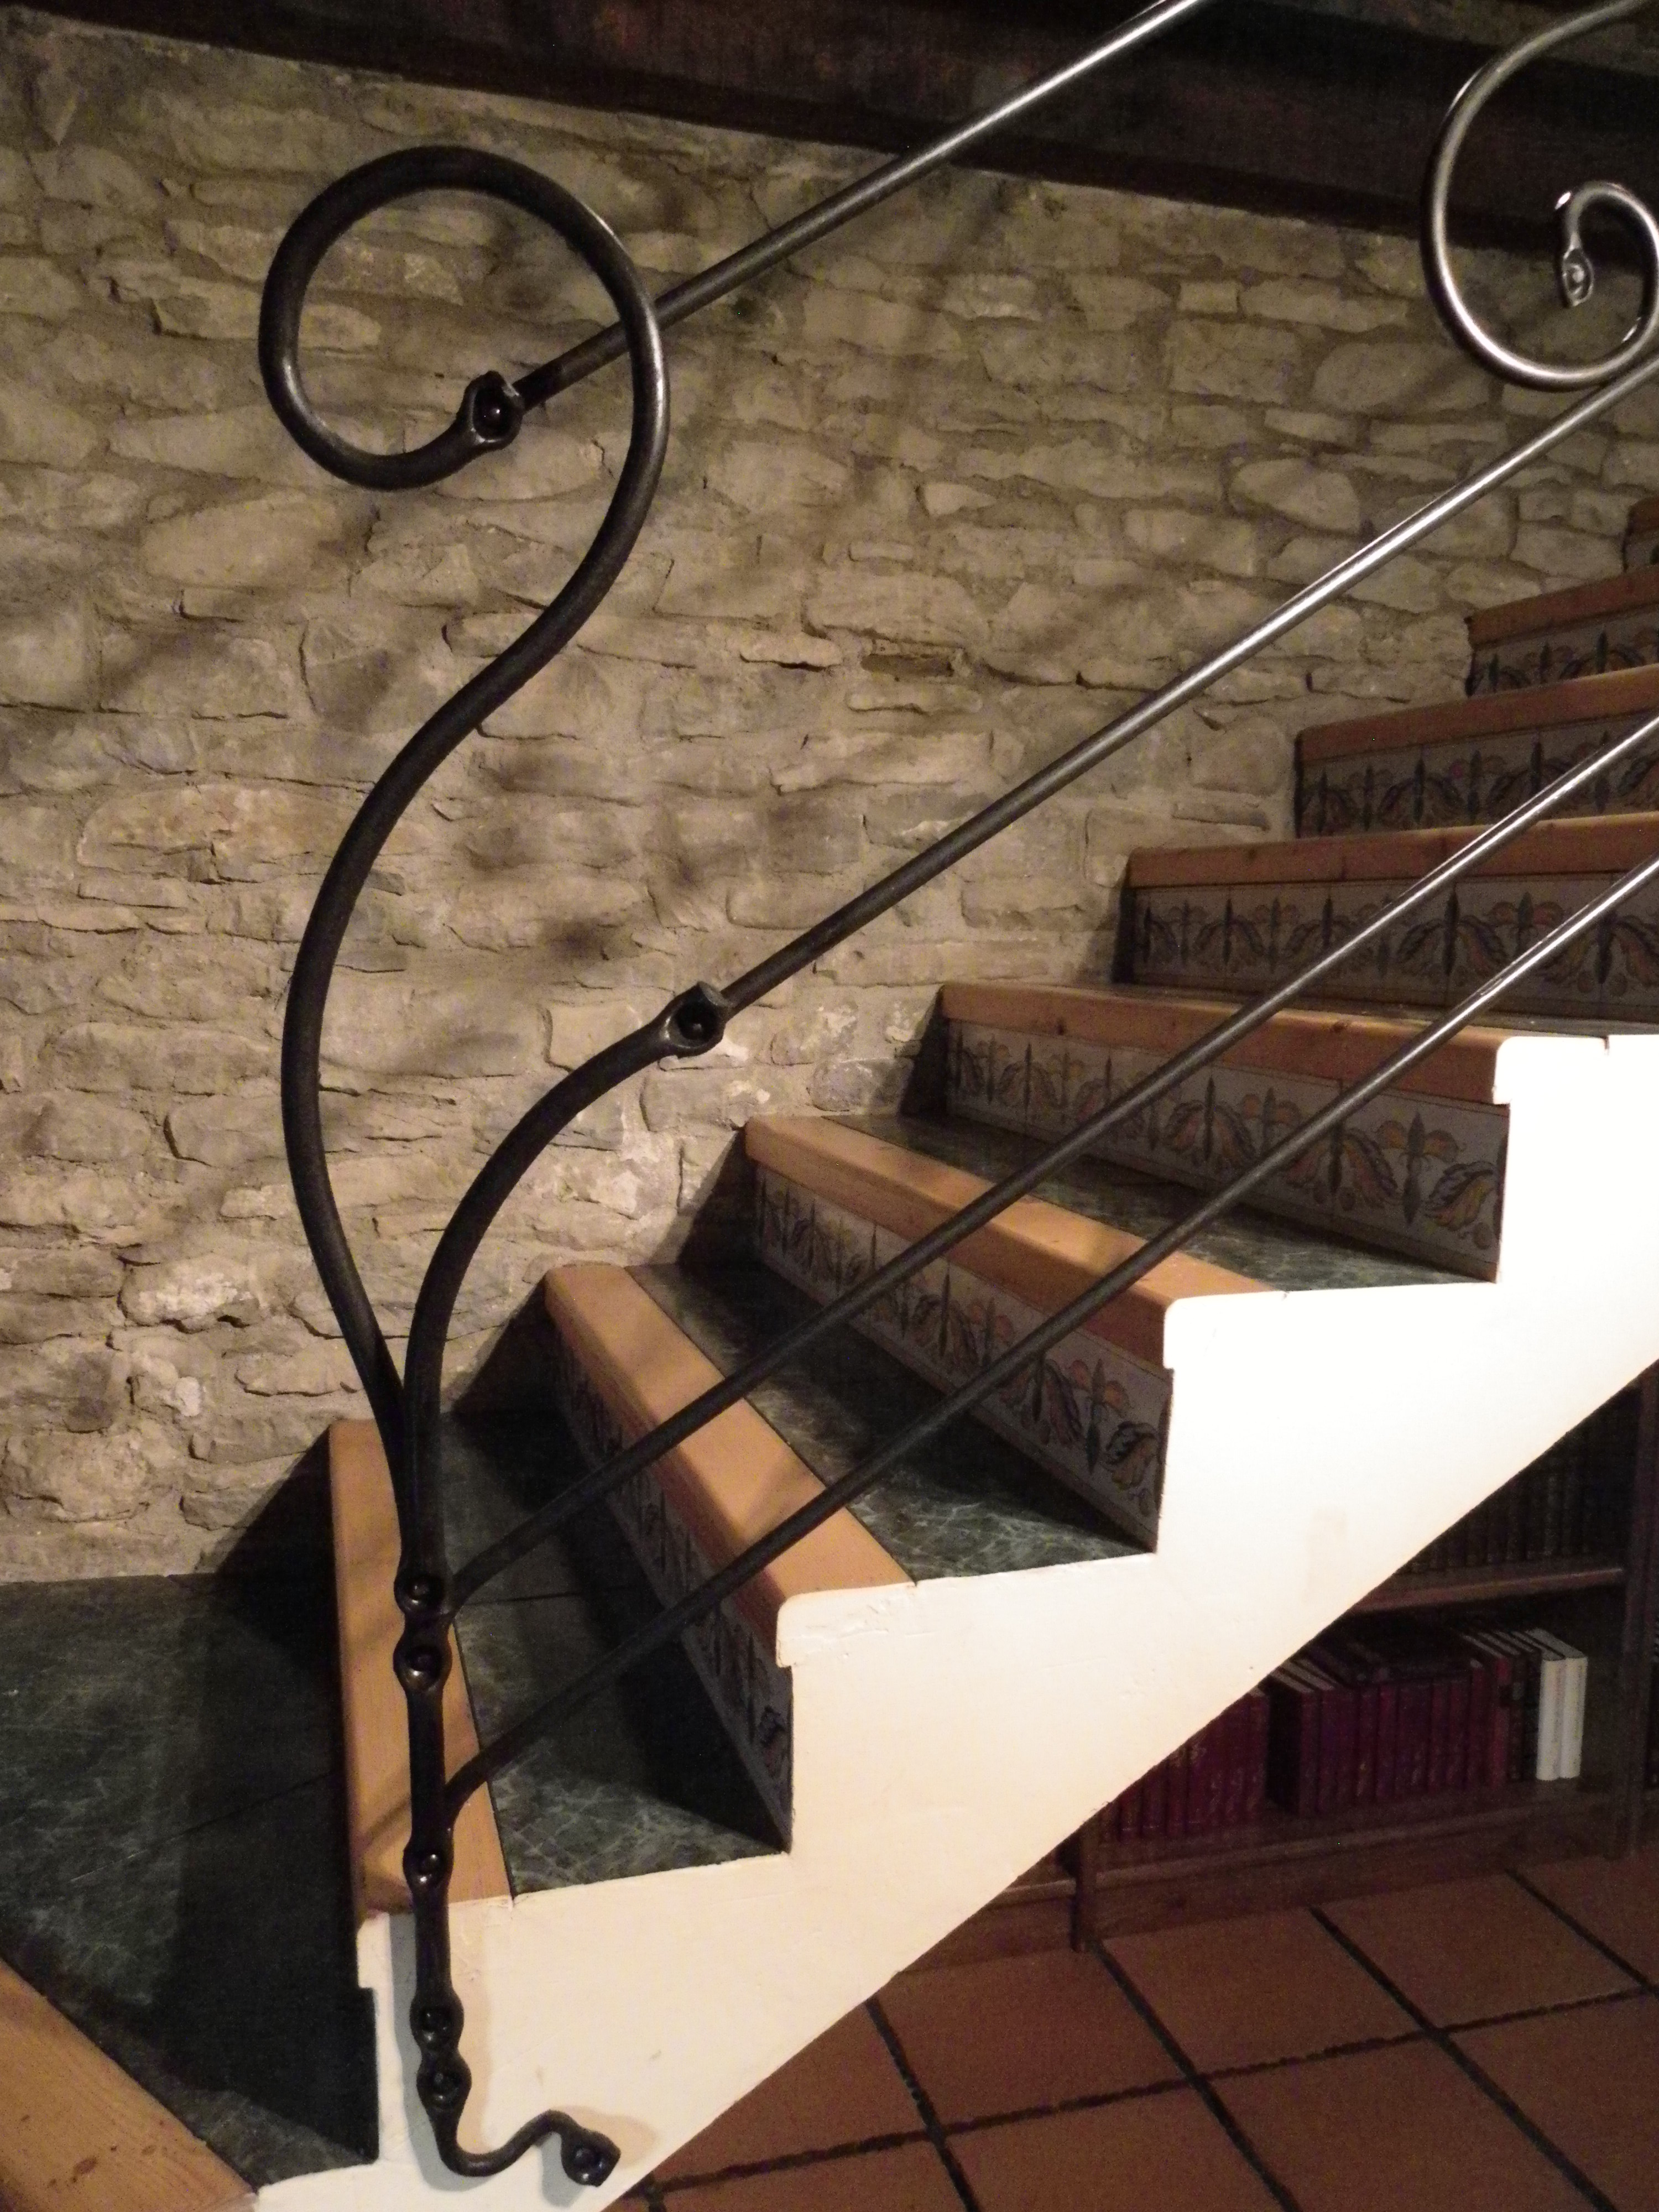 Barandilla forjada la fragua del pirineo - Barandillas de escaleras ...